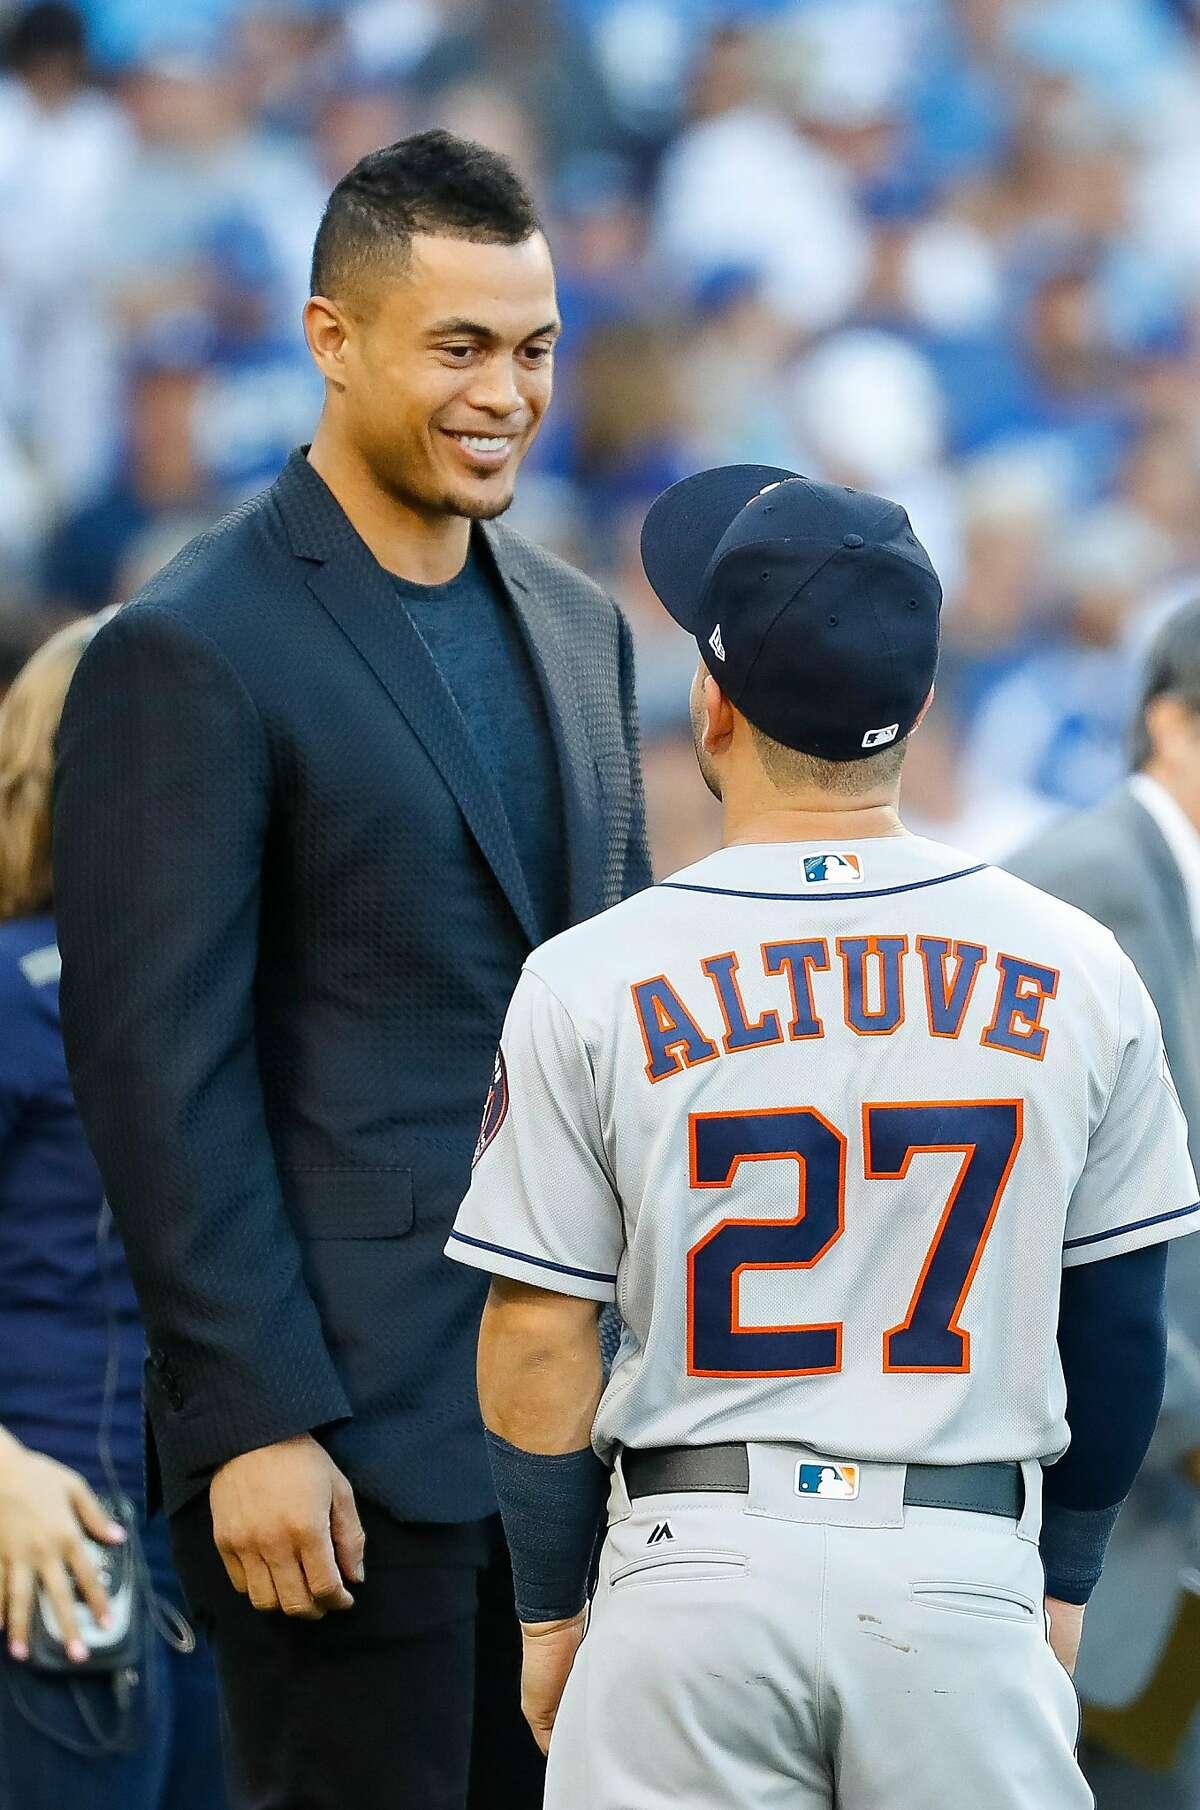 Hank Aaron Award winners Jose Altuve and Giancarlo Stanton talk before Game 2 of the World Series at Dodger Stadium on Wednesday, Oct. 25, 2017, in Los Angeles. ( Karen Warren / Houston Chronicle )